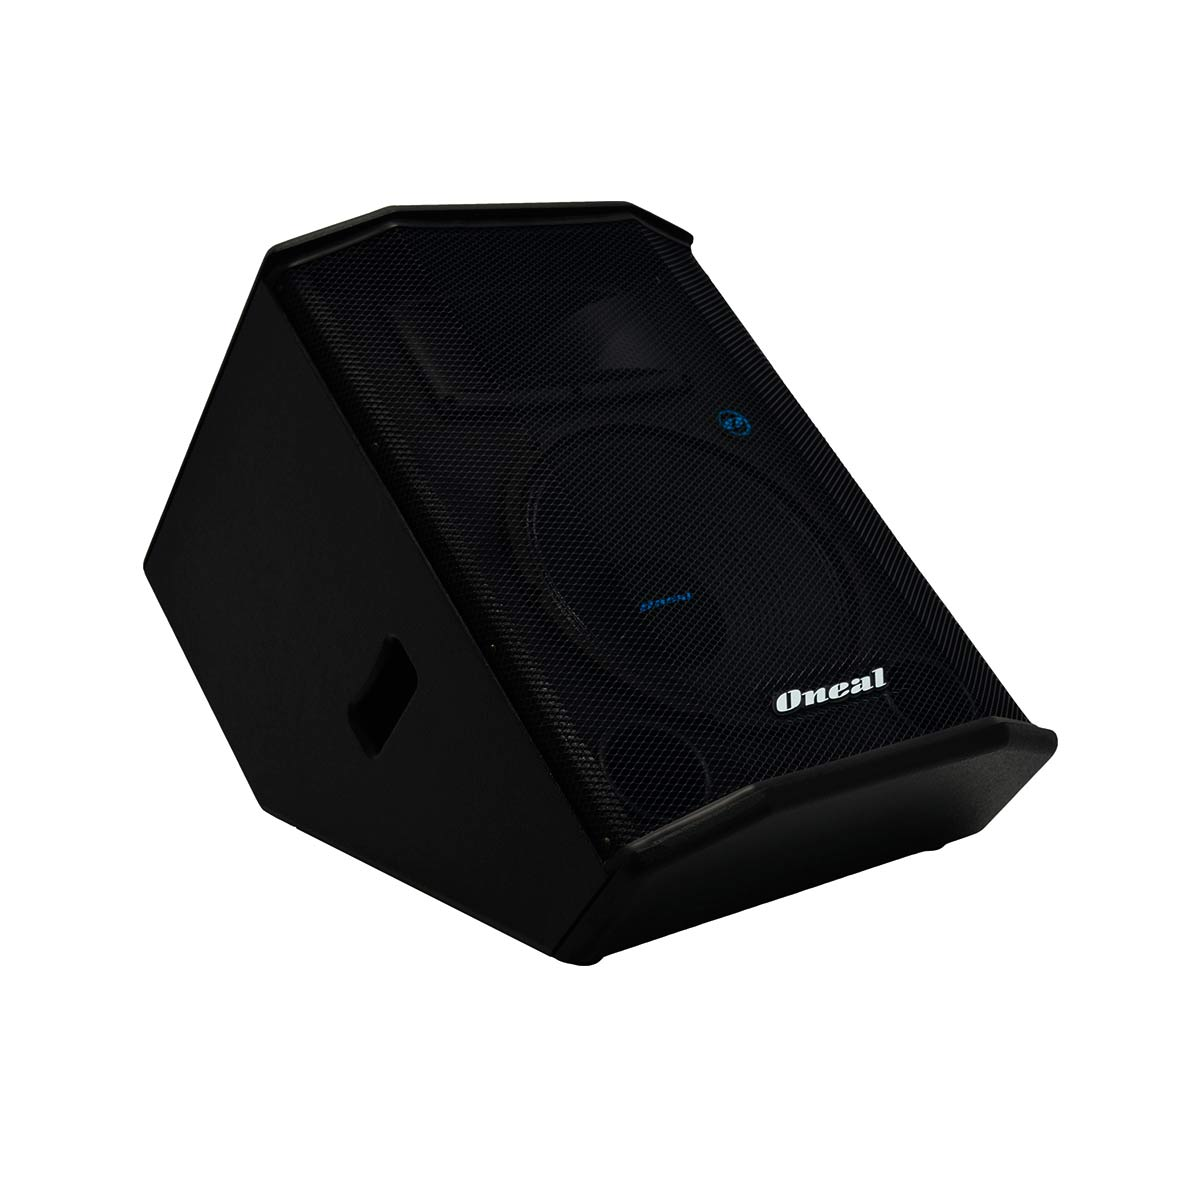 Monitor Ativo Fal 15 Pol 400W - OPM 1025 Oneal